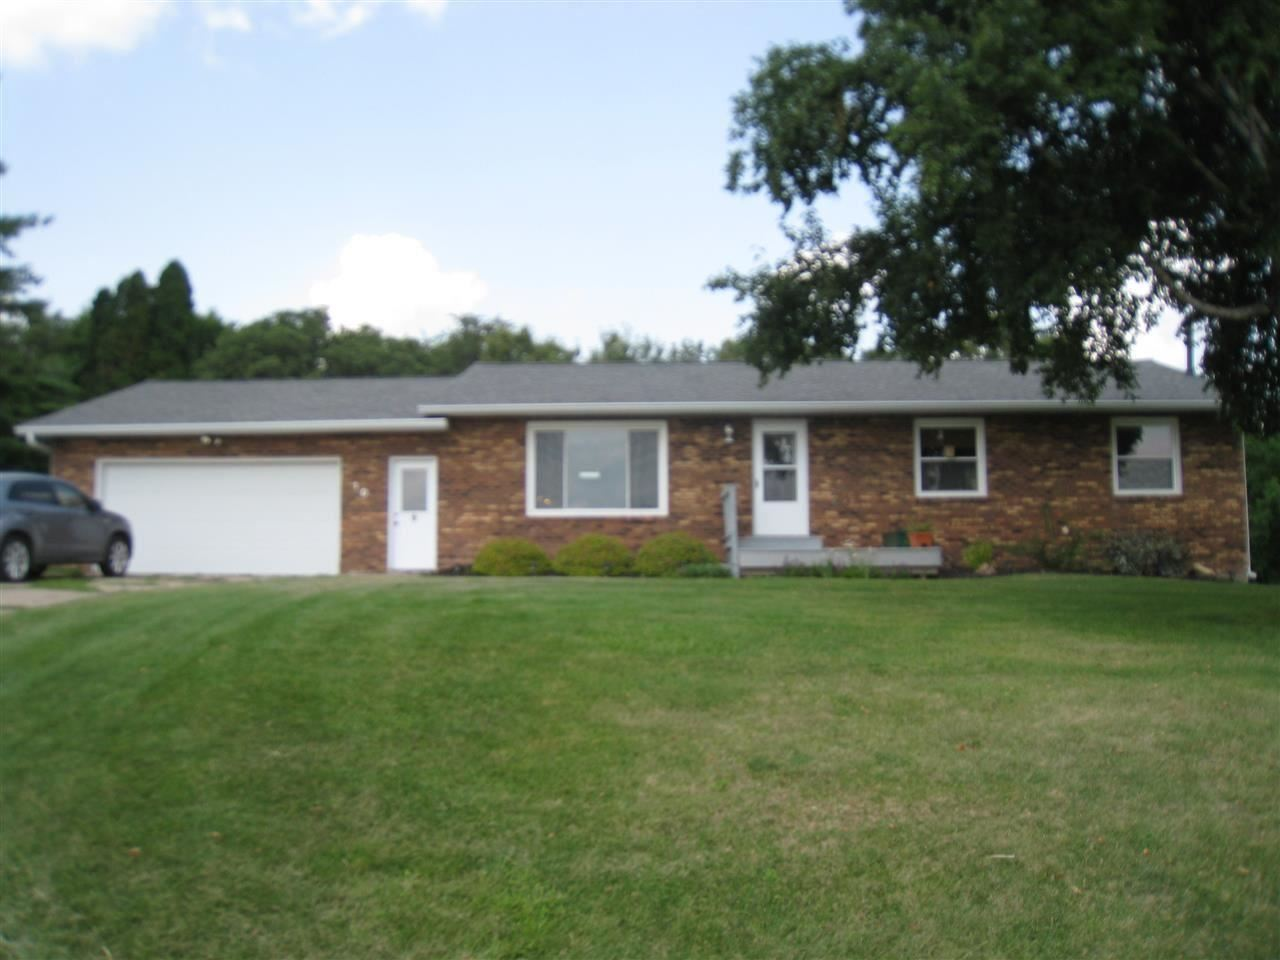 Real Estate for Sale, ListingId: 31589856, Orion,IL61273